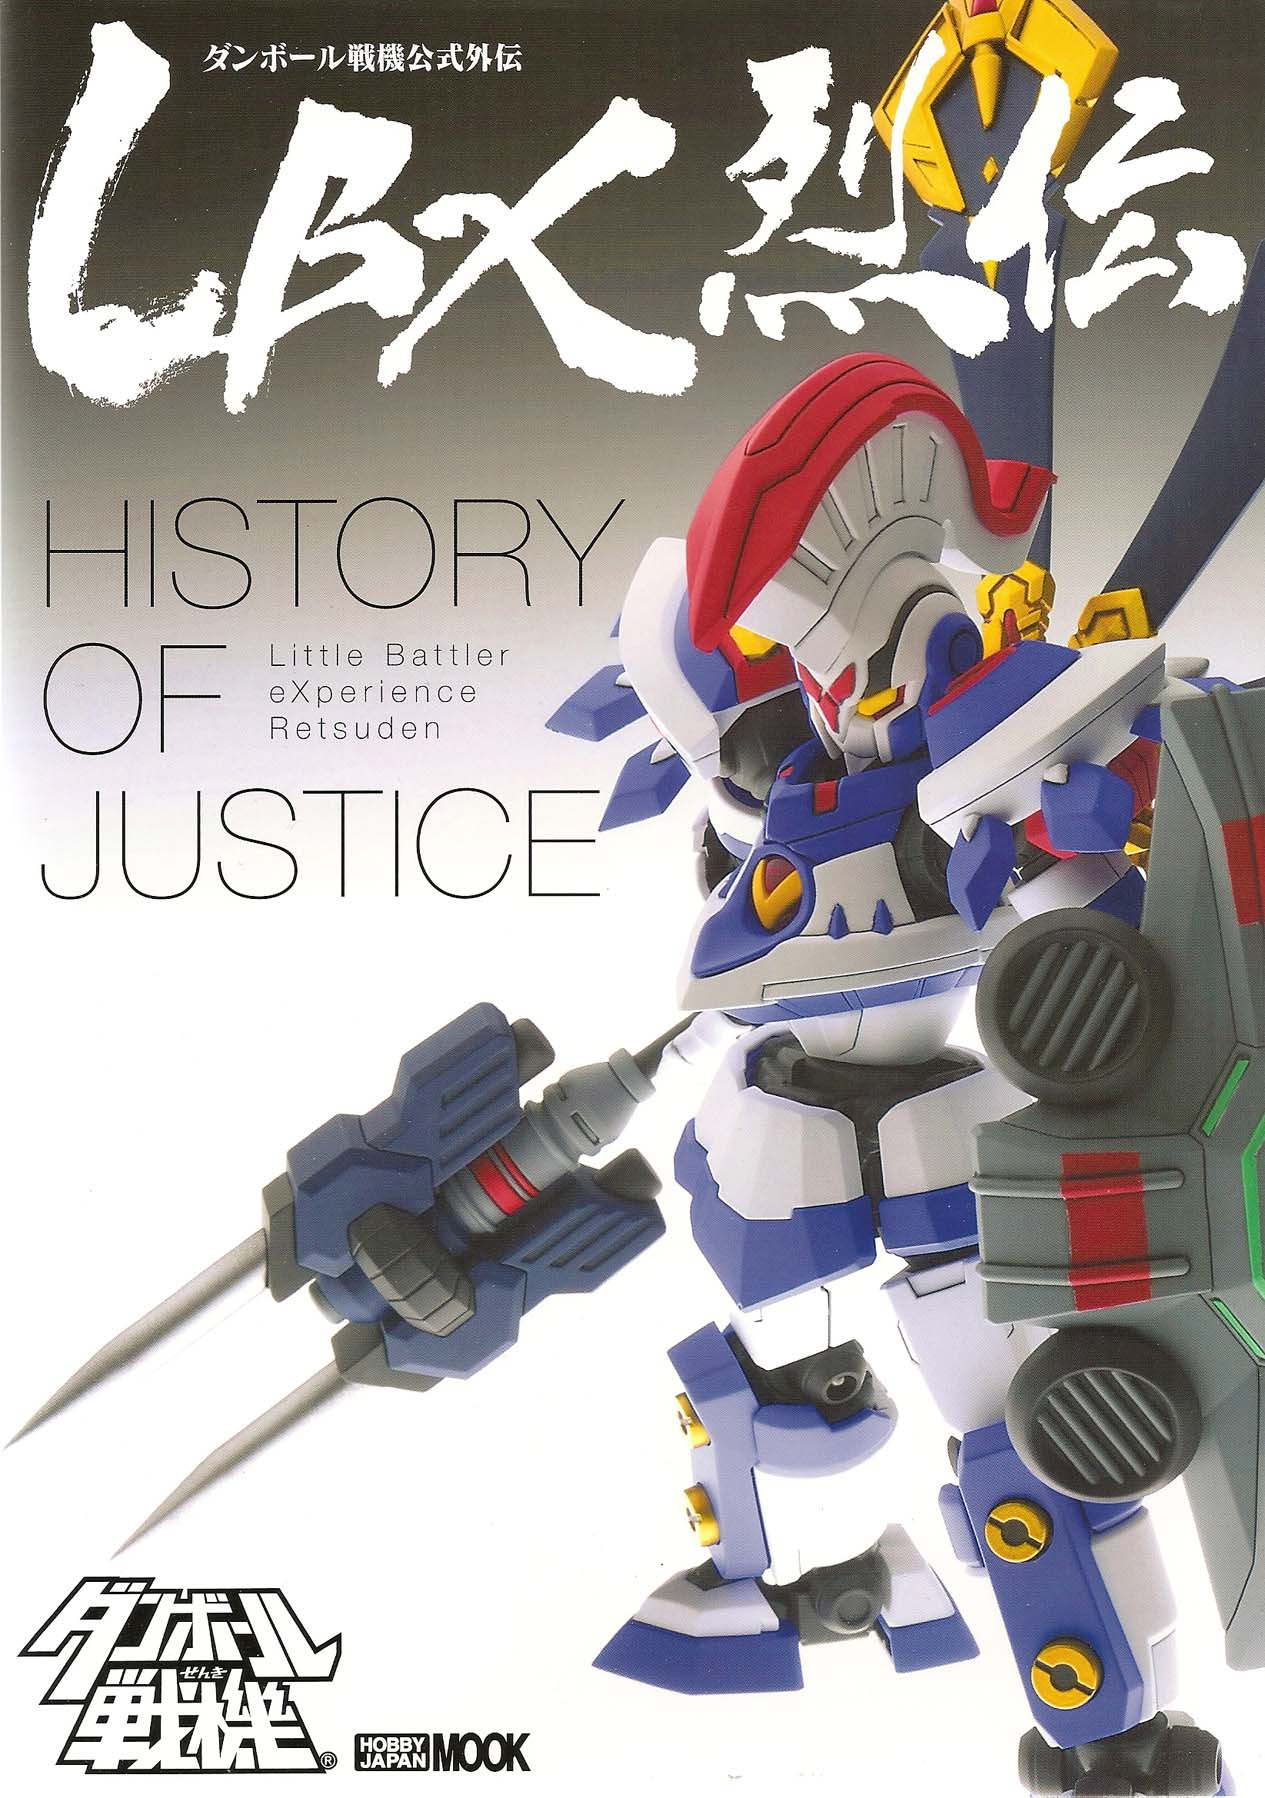 LBX Retsuden: History of Justice | Danball Senki Wiki